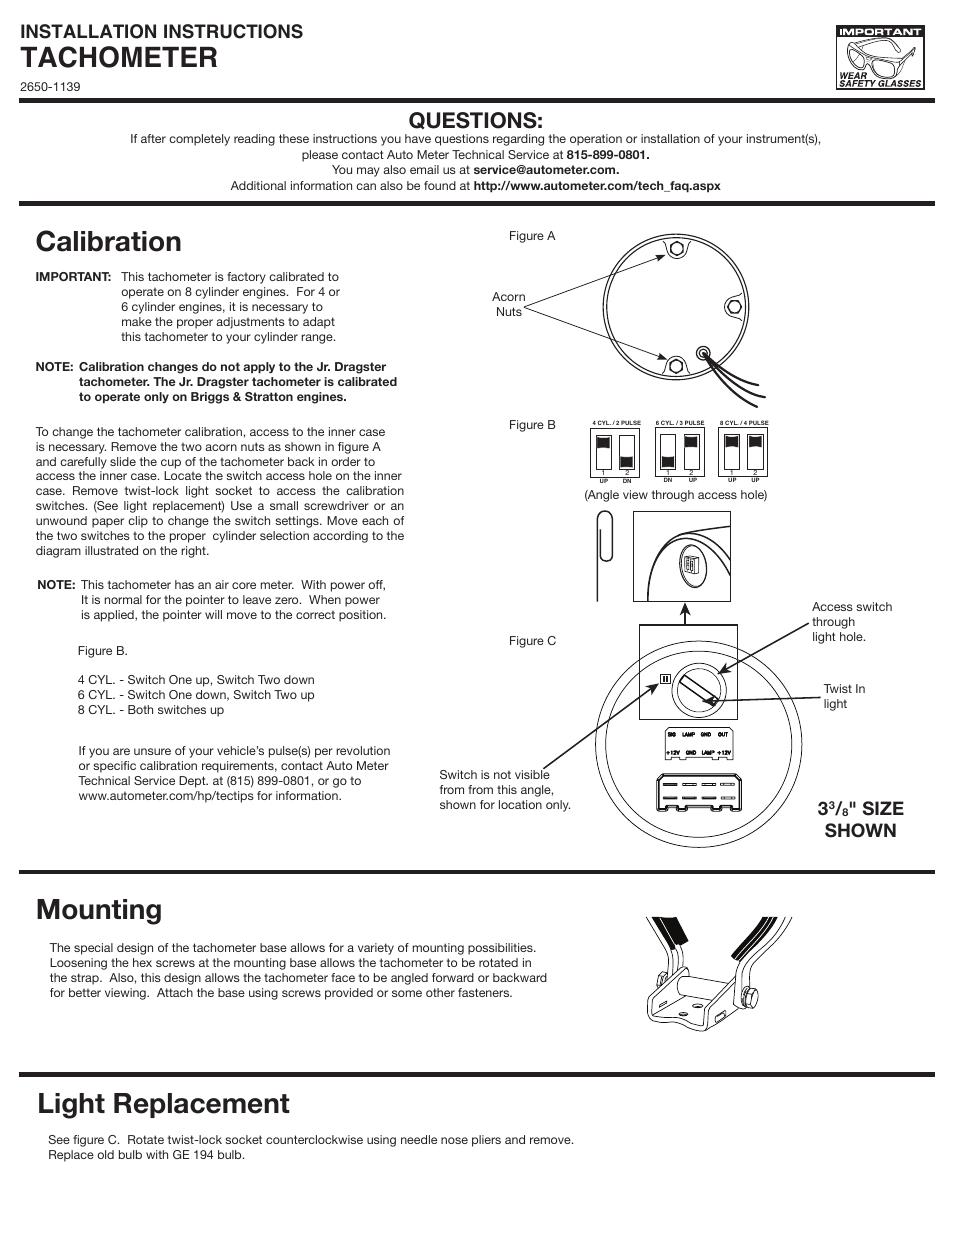 Auto Meter 2895 User Manual